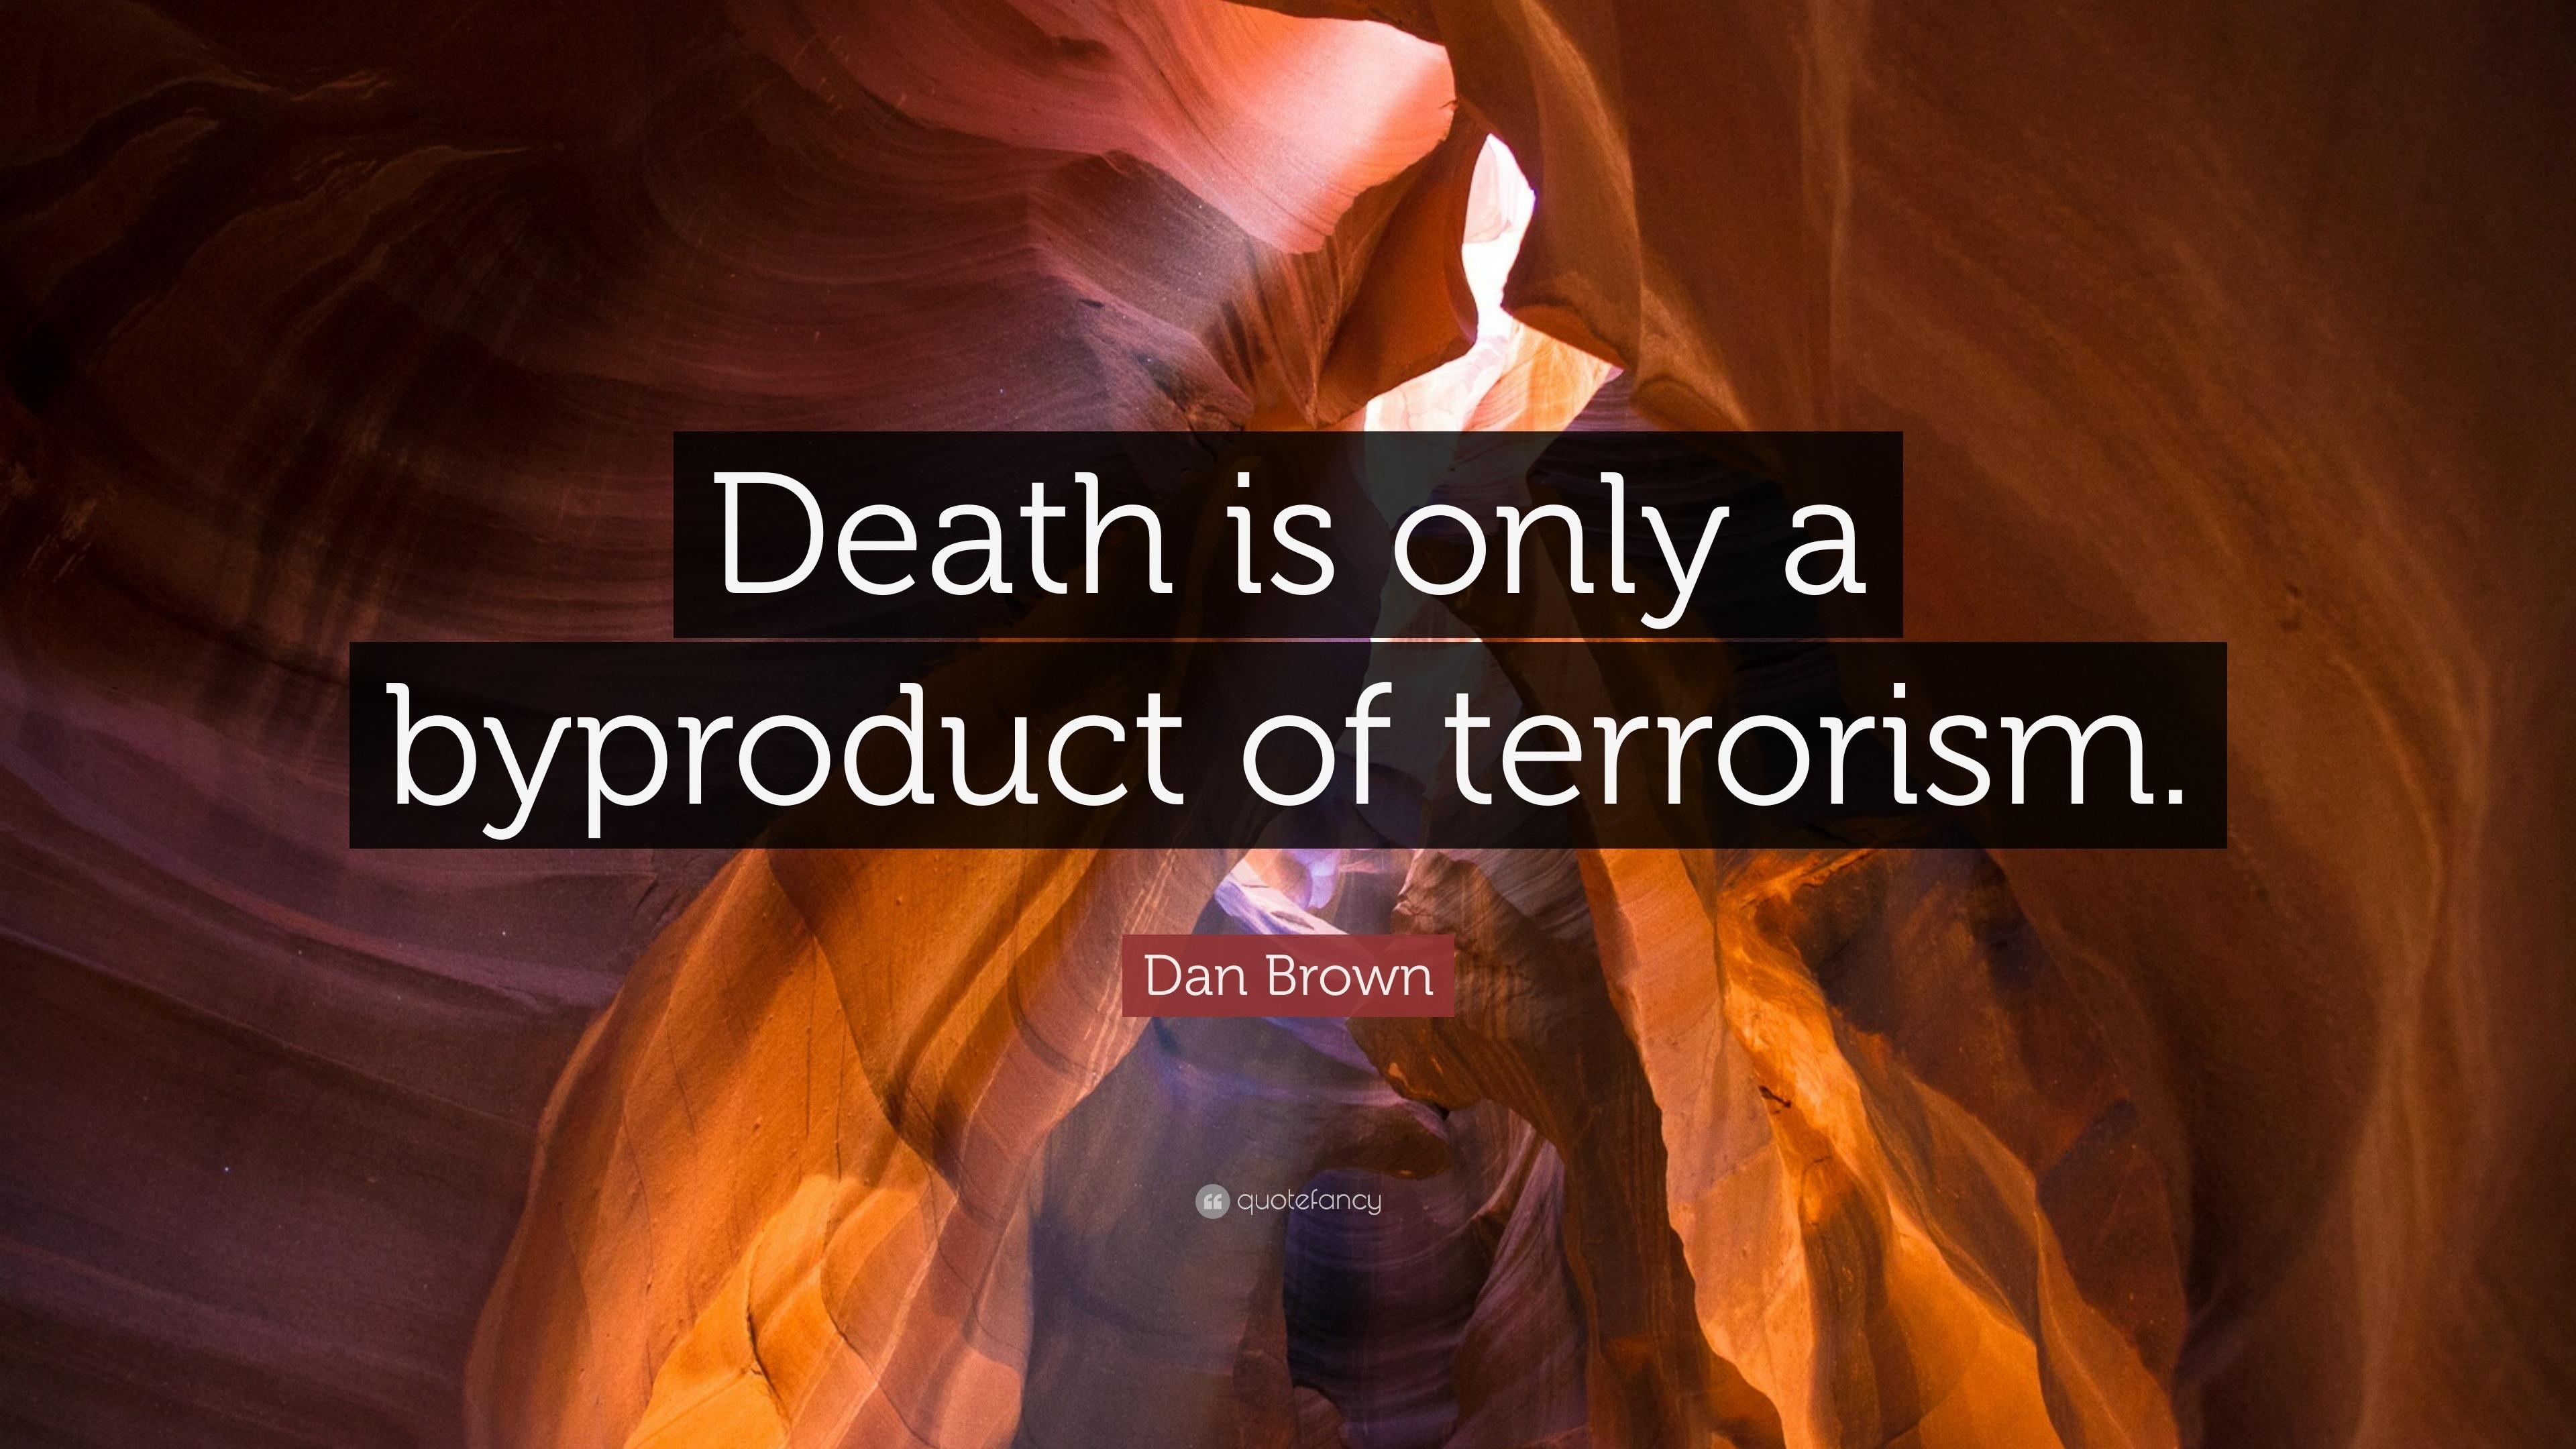 Death to Dan Brown